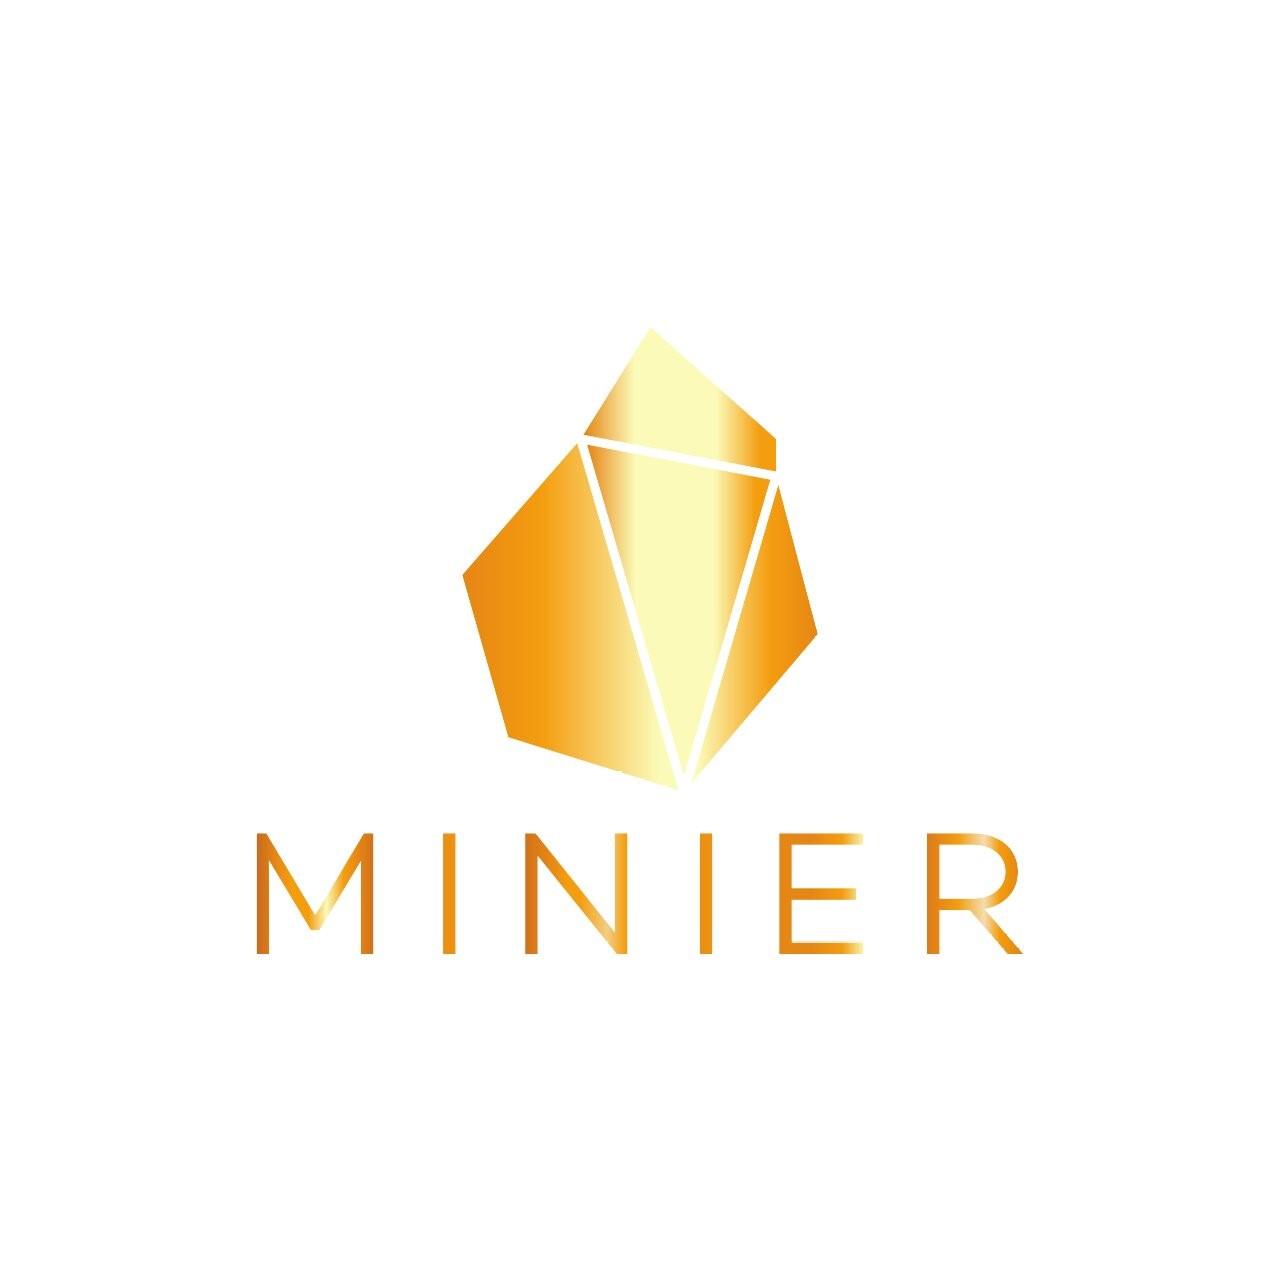 minier and posette